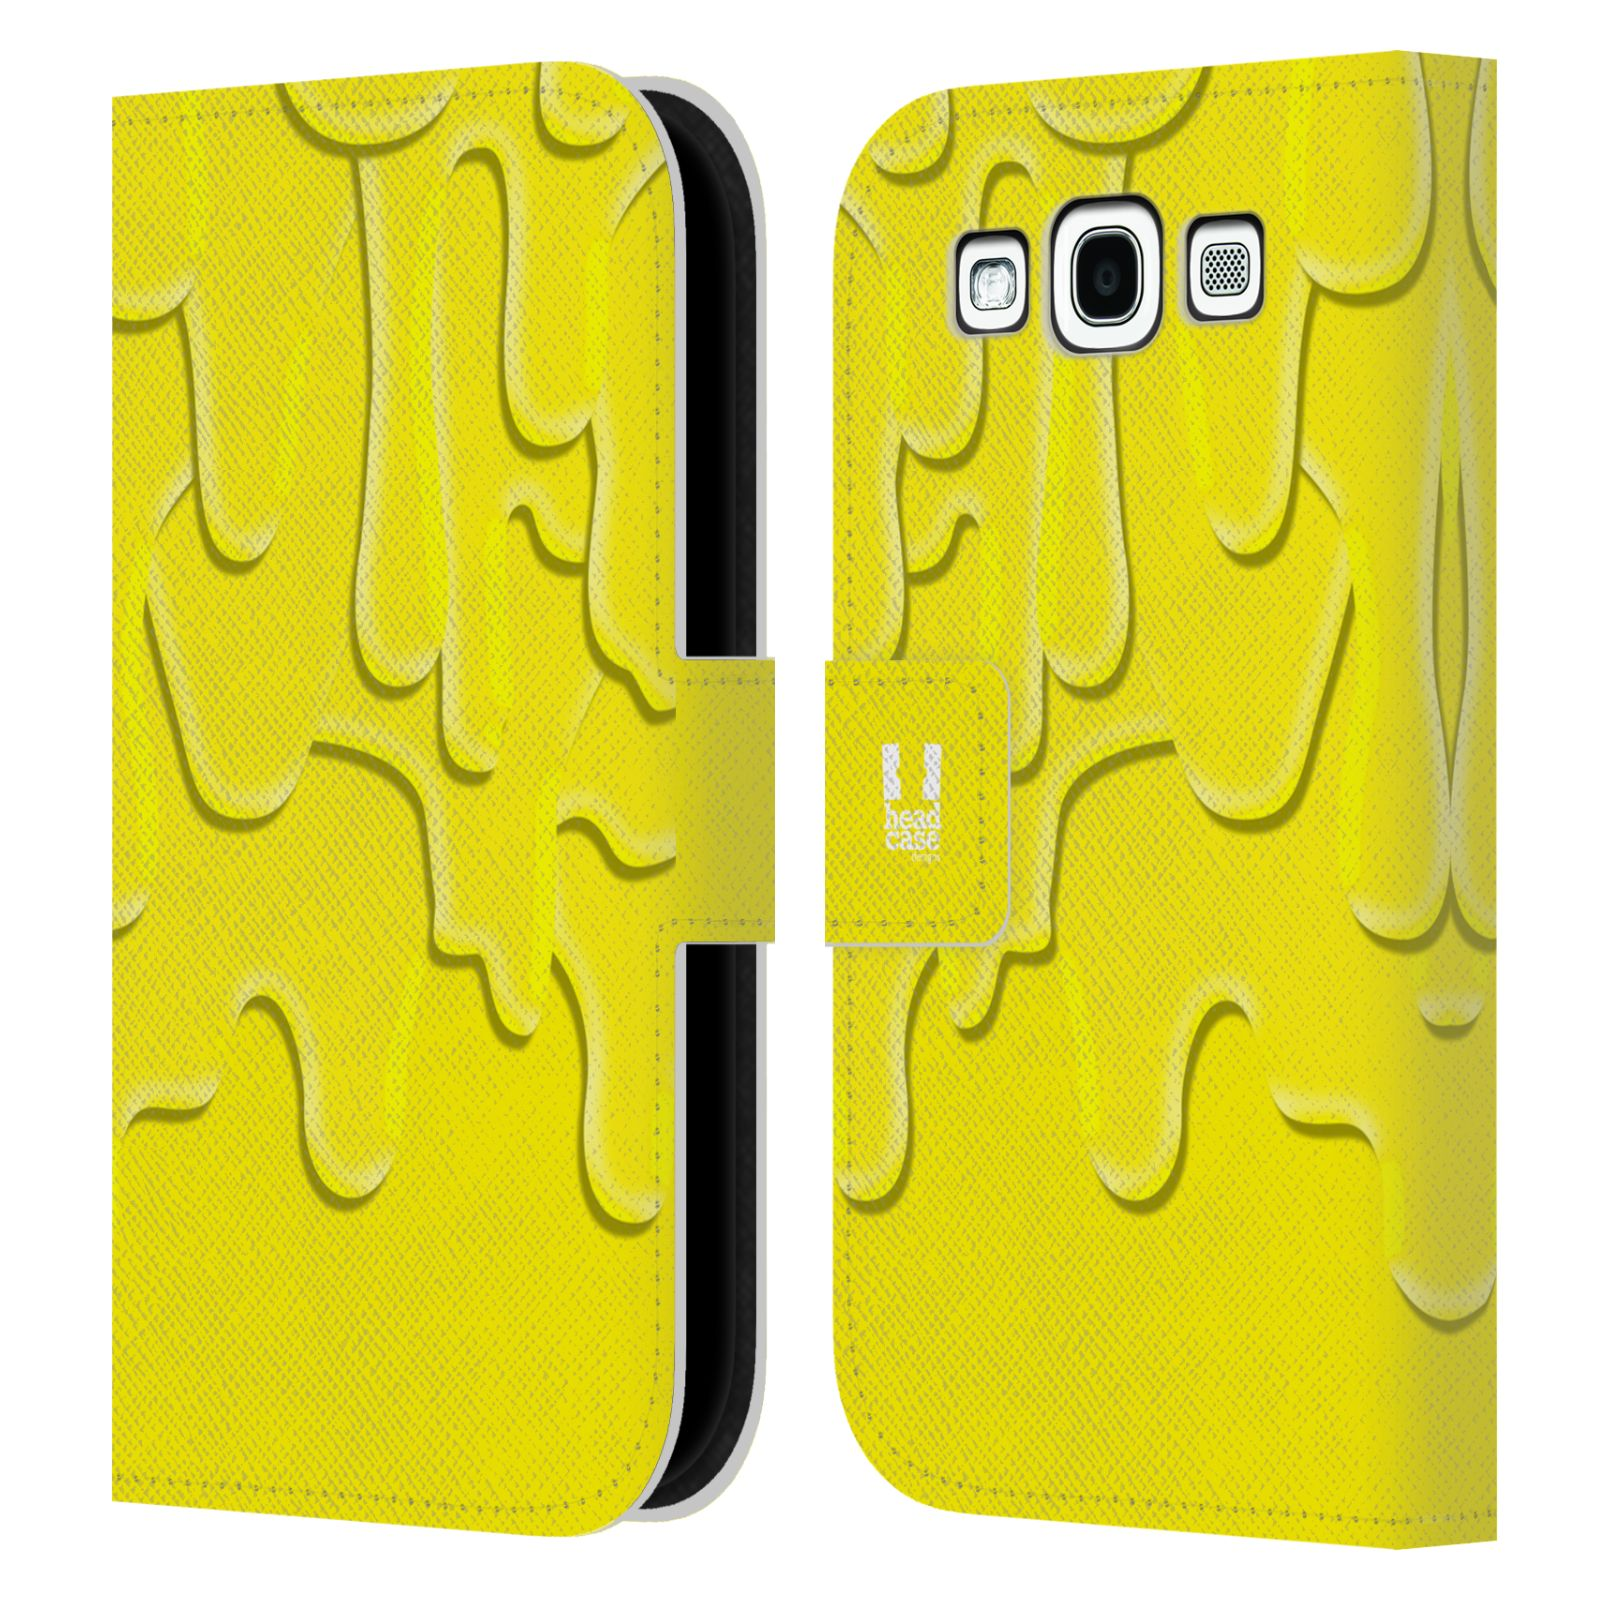 HEAD CASE Flipové pouzdro pro mobil Samsung Galaxy S3 ZÁPLAVA BARVA žlutá